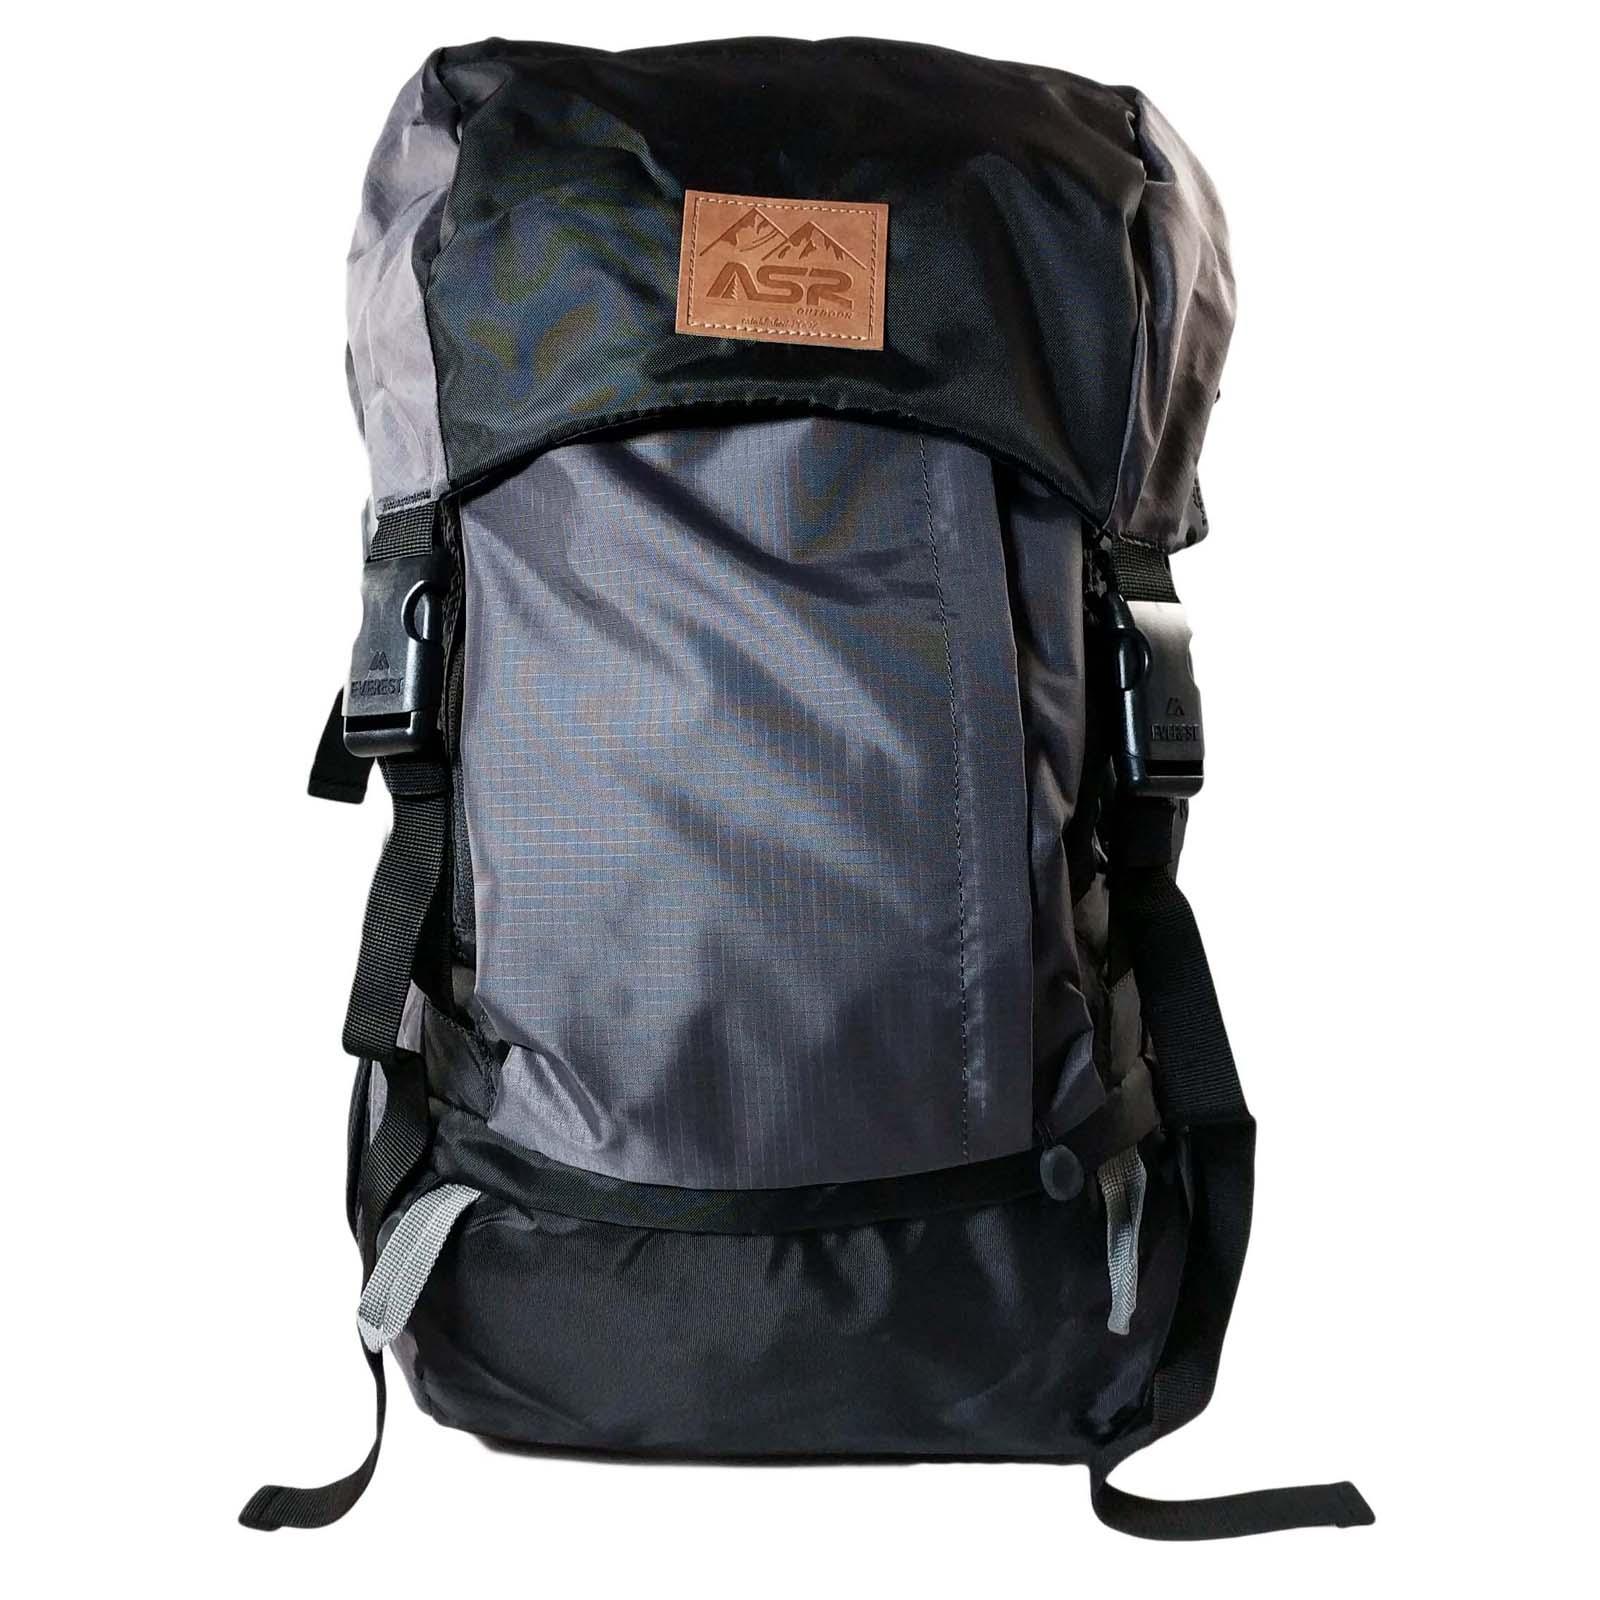 ASR Outdoor Weekender Day Packing Hiking Backpack - Gray